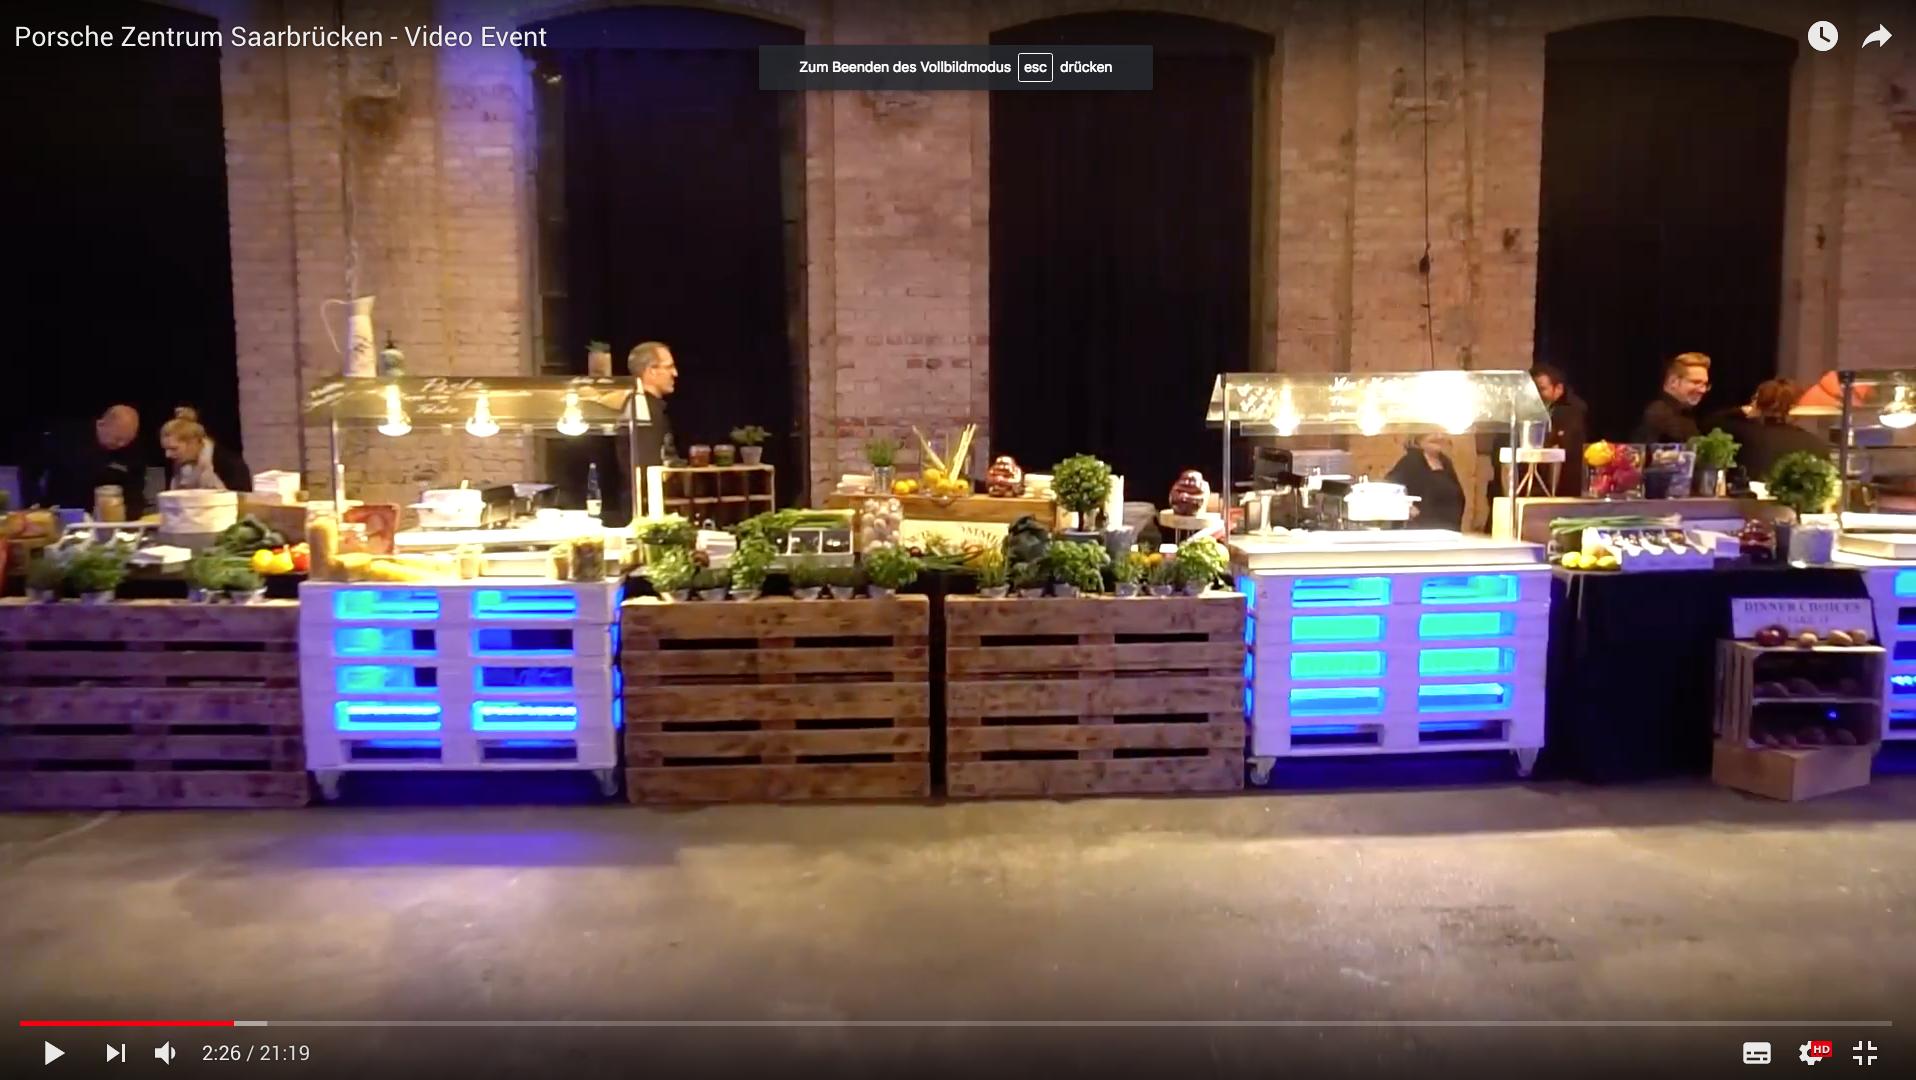 2017 Prosche Zentrum Saarbrücken - Video Event Buffet_MSM_MEDIEN_SAAR_MOSEL_SAARLAND_FERNSEHEN_1_ED_SAAR